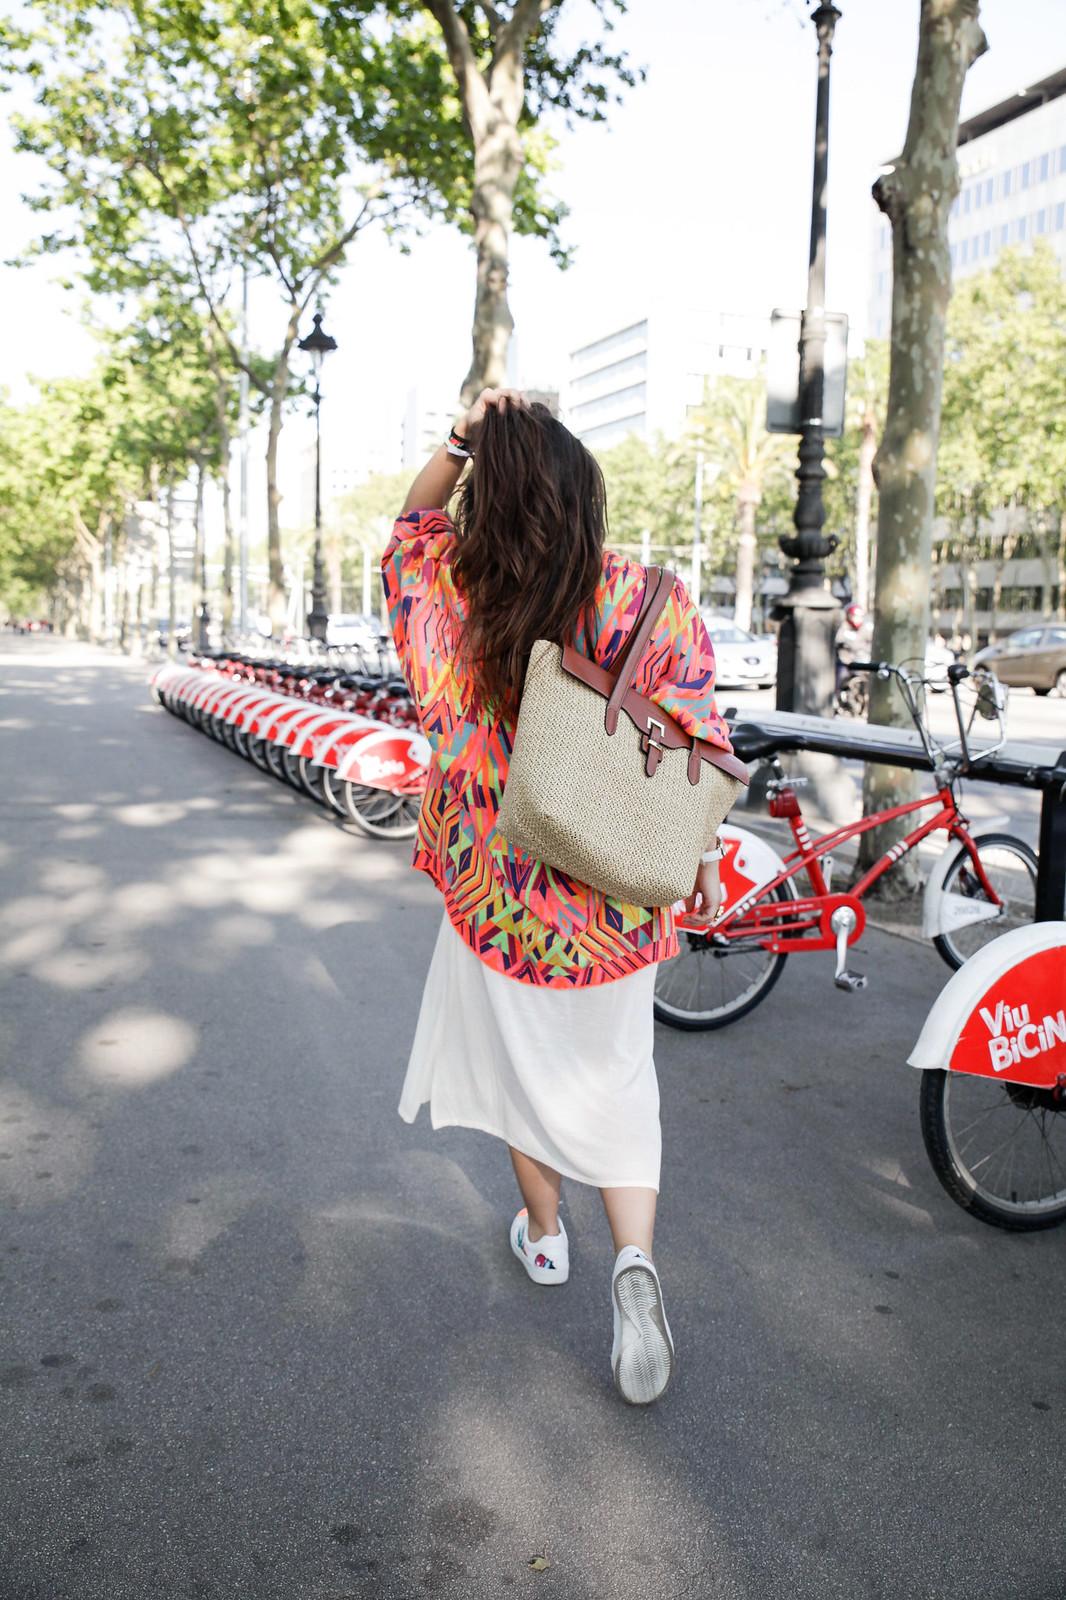 015_kimono_look_street_style_barcelona_theguestgirl_pepe_moll_ruga_caroline_svedbom_kapten_son